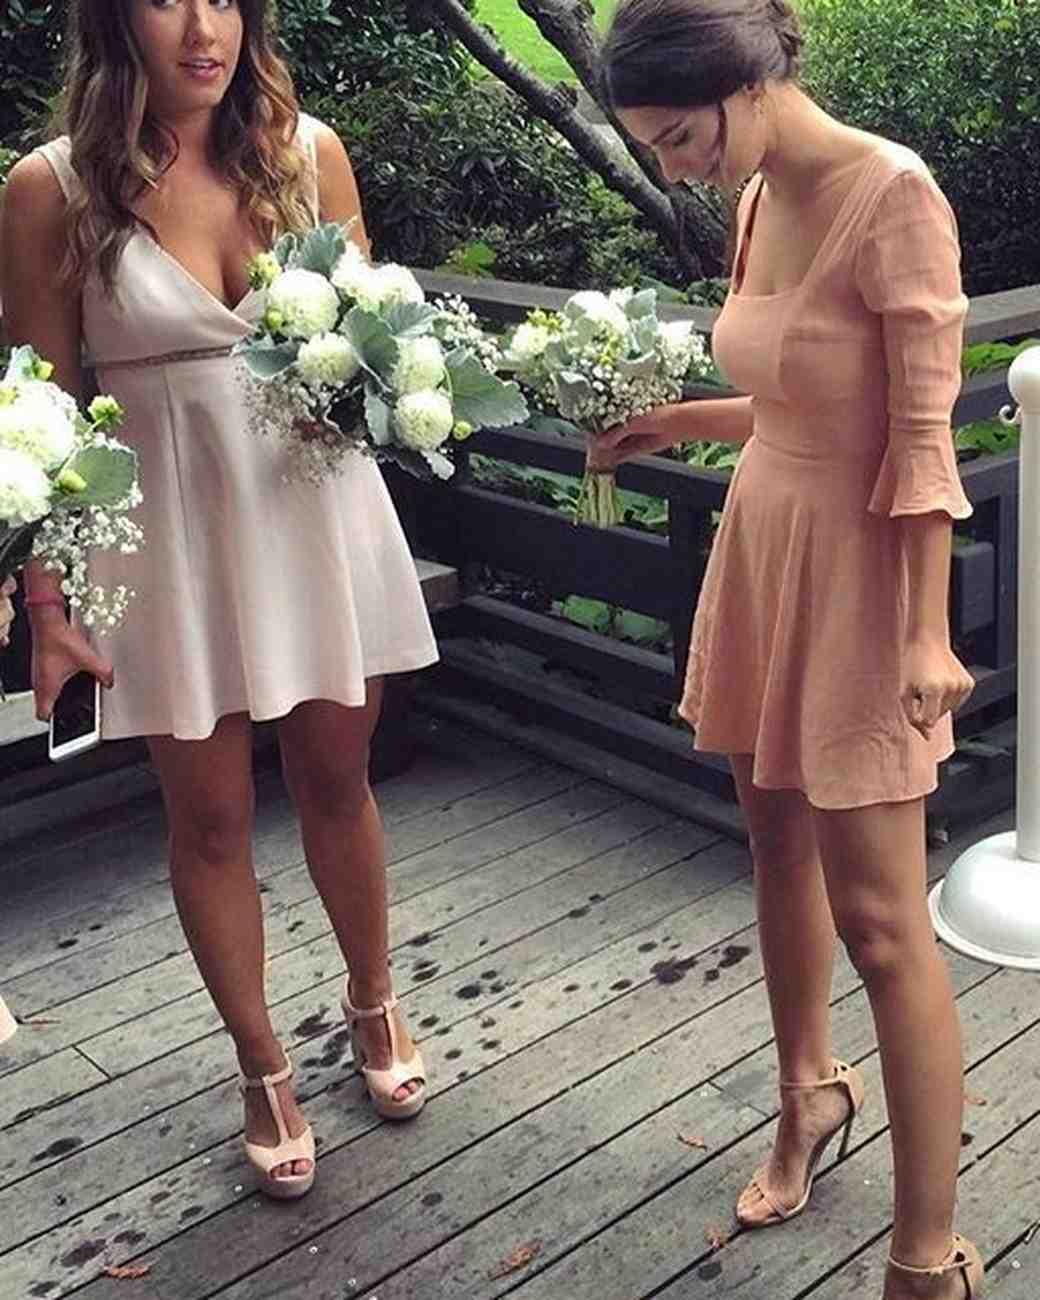 Emily Ratajkowski was a bridesmaid in wedding of a friend